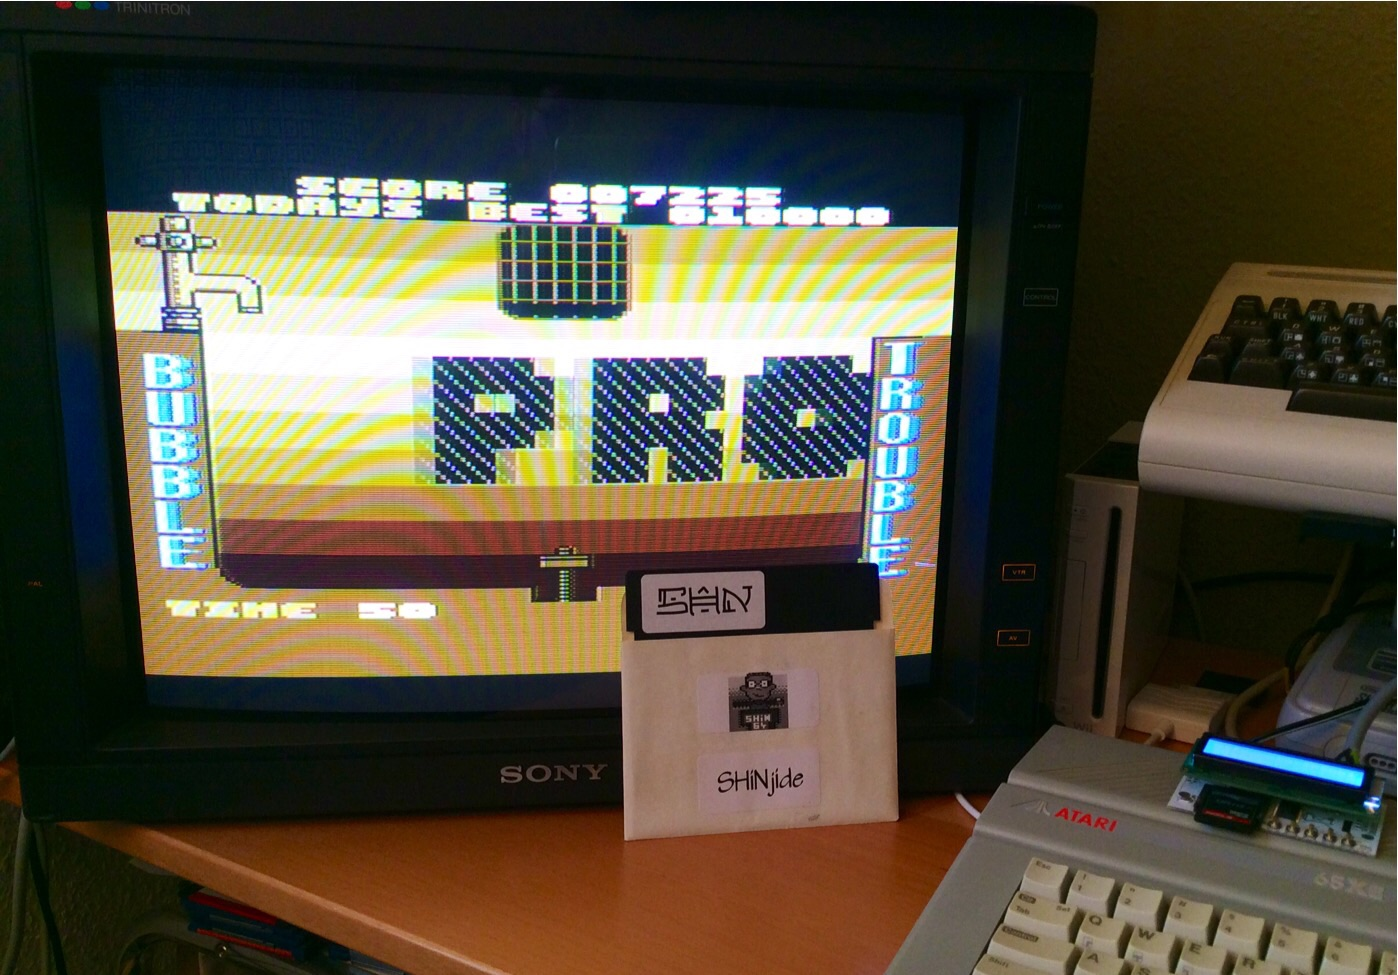 SHiNjide: Bubble Trouble (Atari 400/800/XL/XE) 7,225 points on 2015-01-11 05:55:39